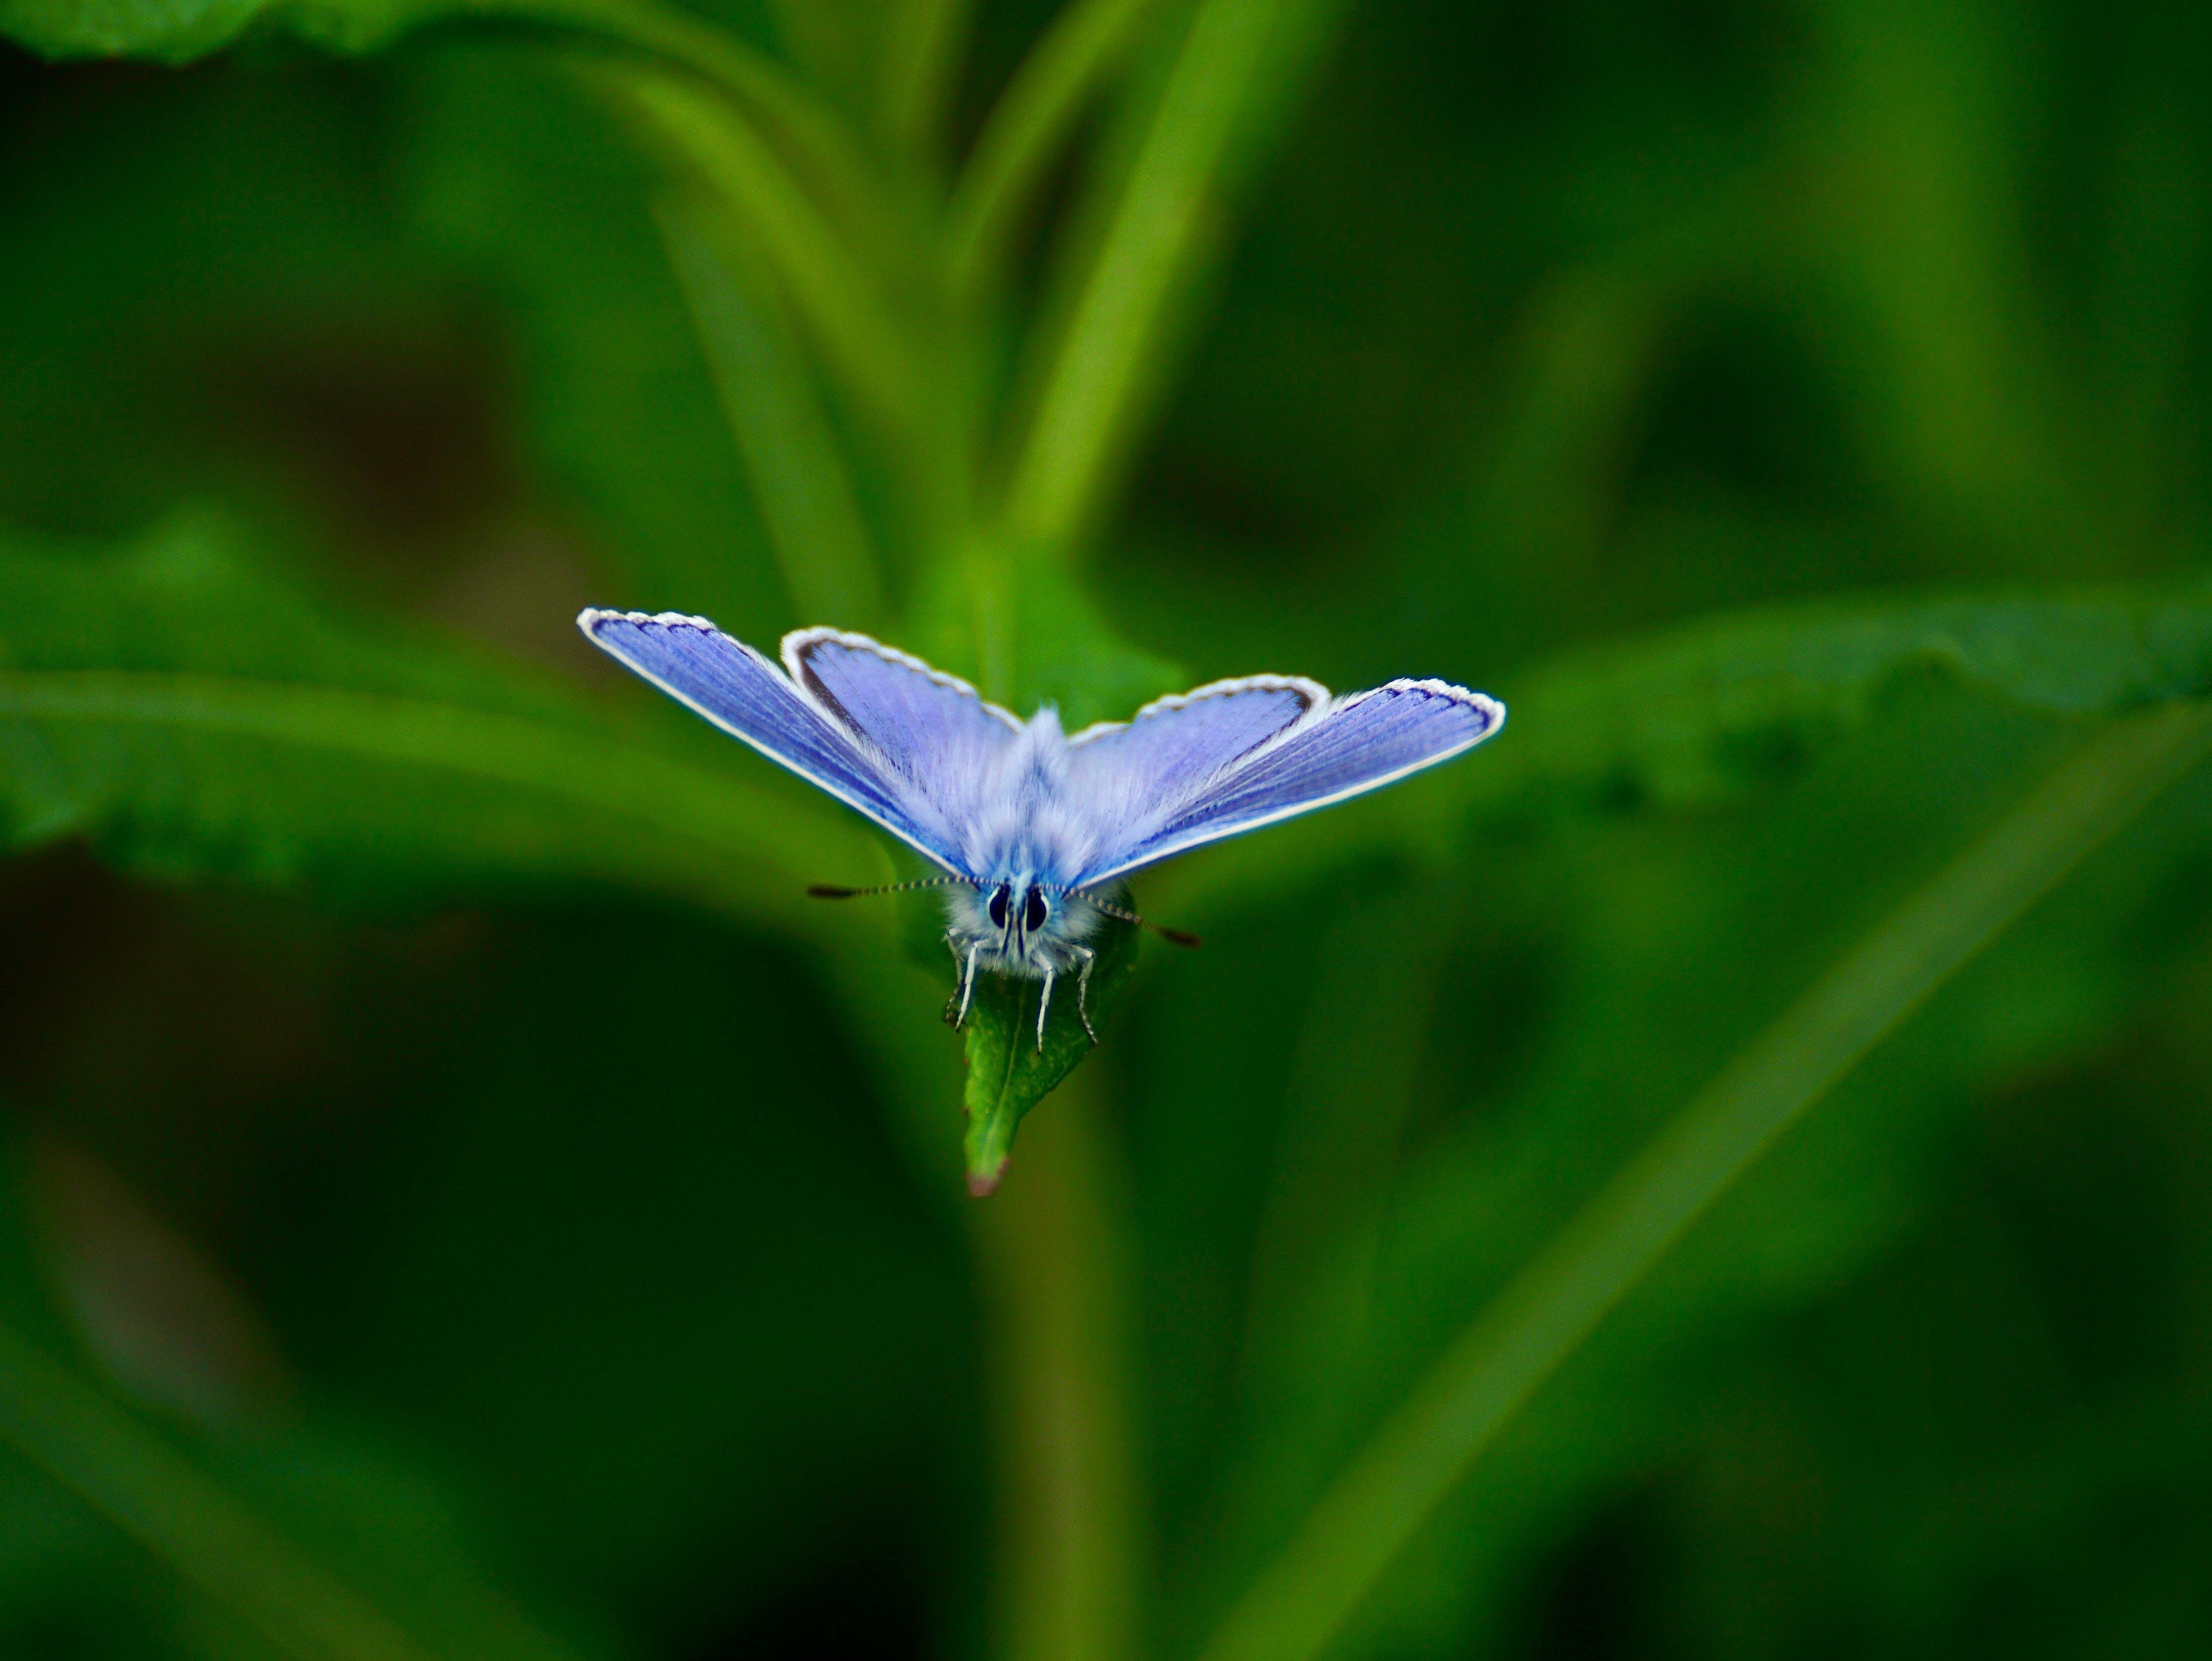 Kostenloses Stock Foto zu edelfalter, gras, insekt, makro